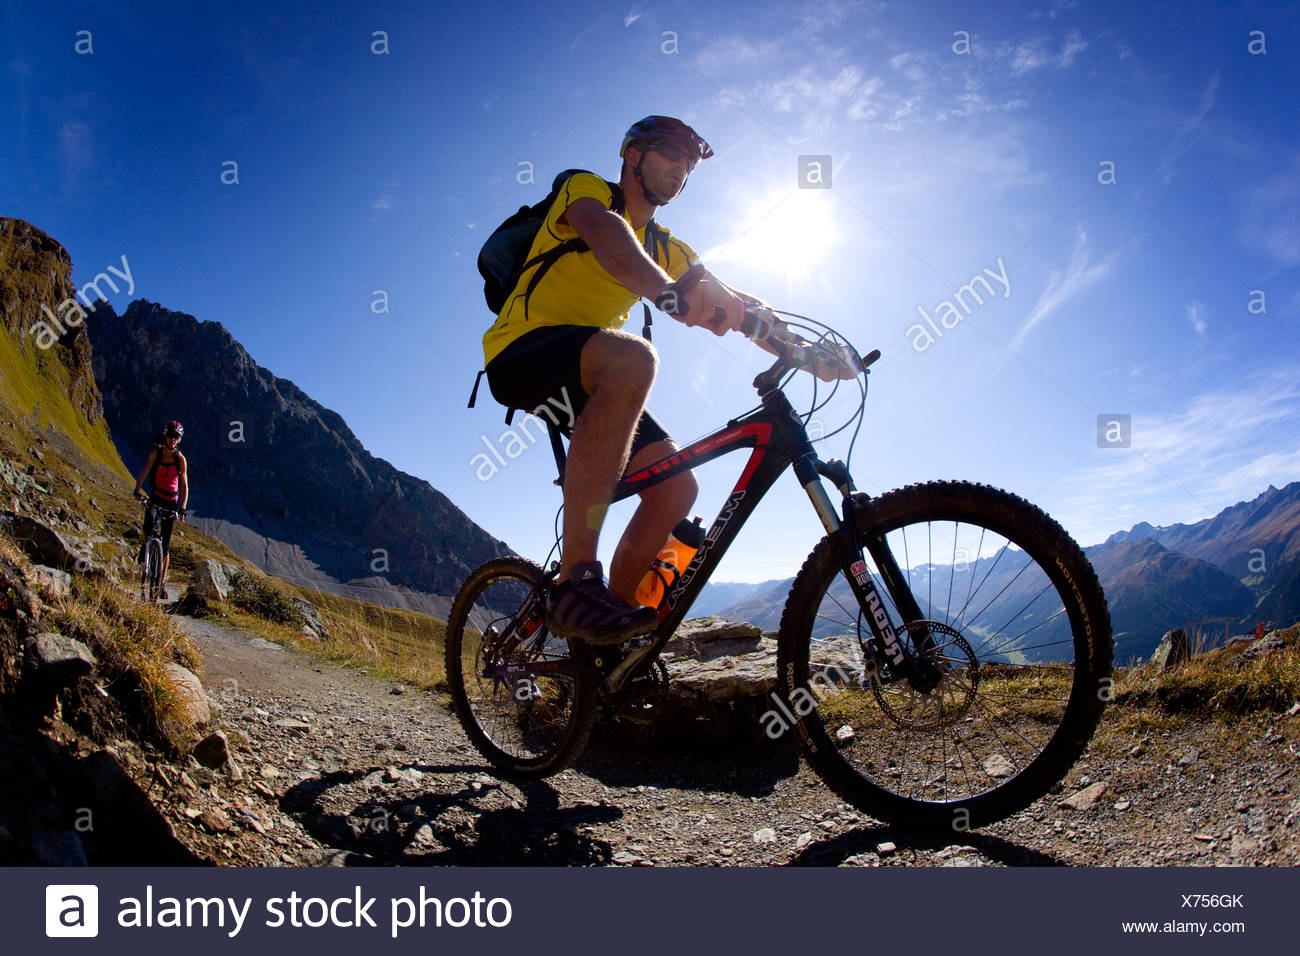 Schweiz Swiss Herbst Biken Biker fahren ein Fahrrad zwei paar paar Panoramaweg Strelapass Davos Berge Fahrrad Rad Stockbild